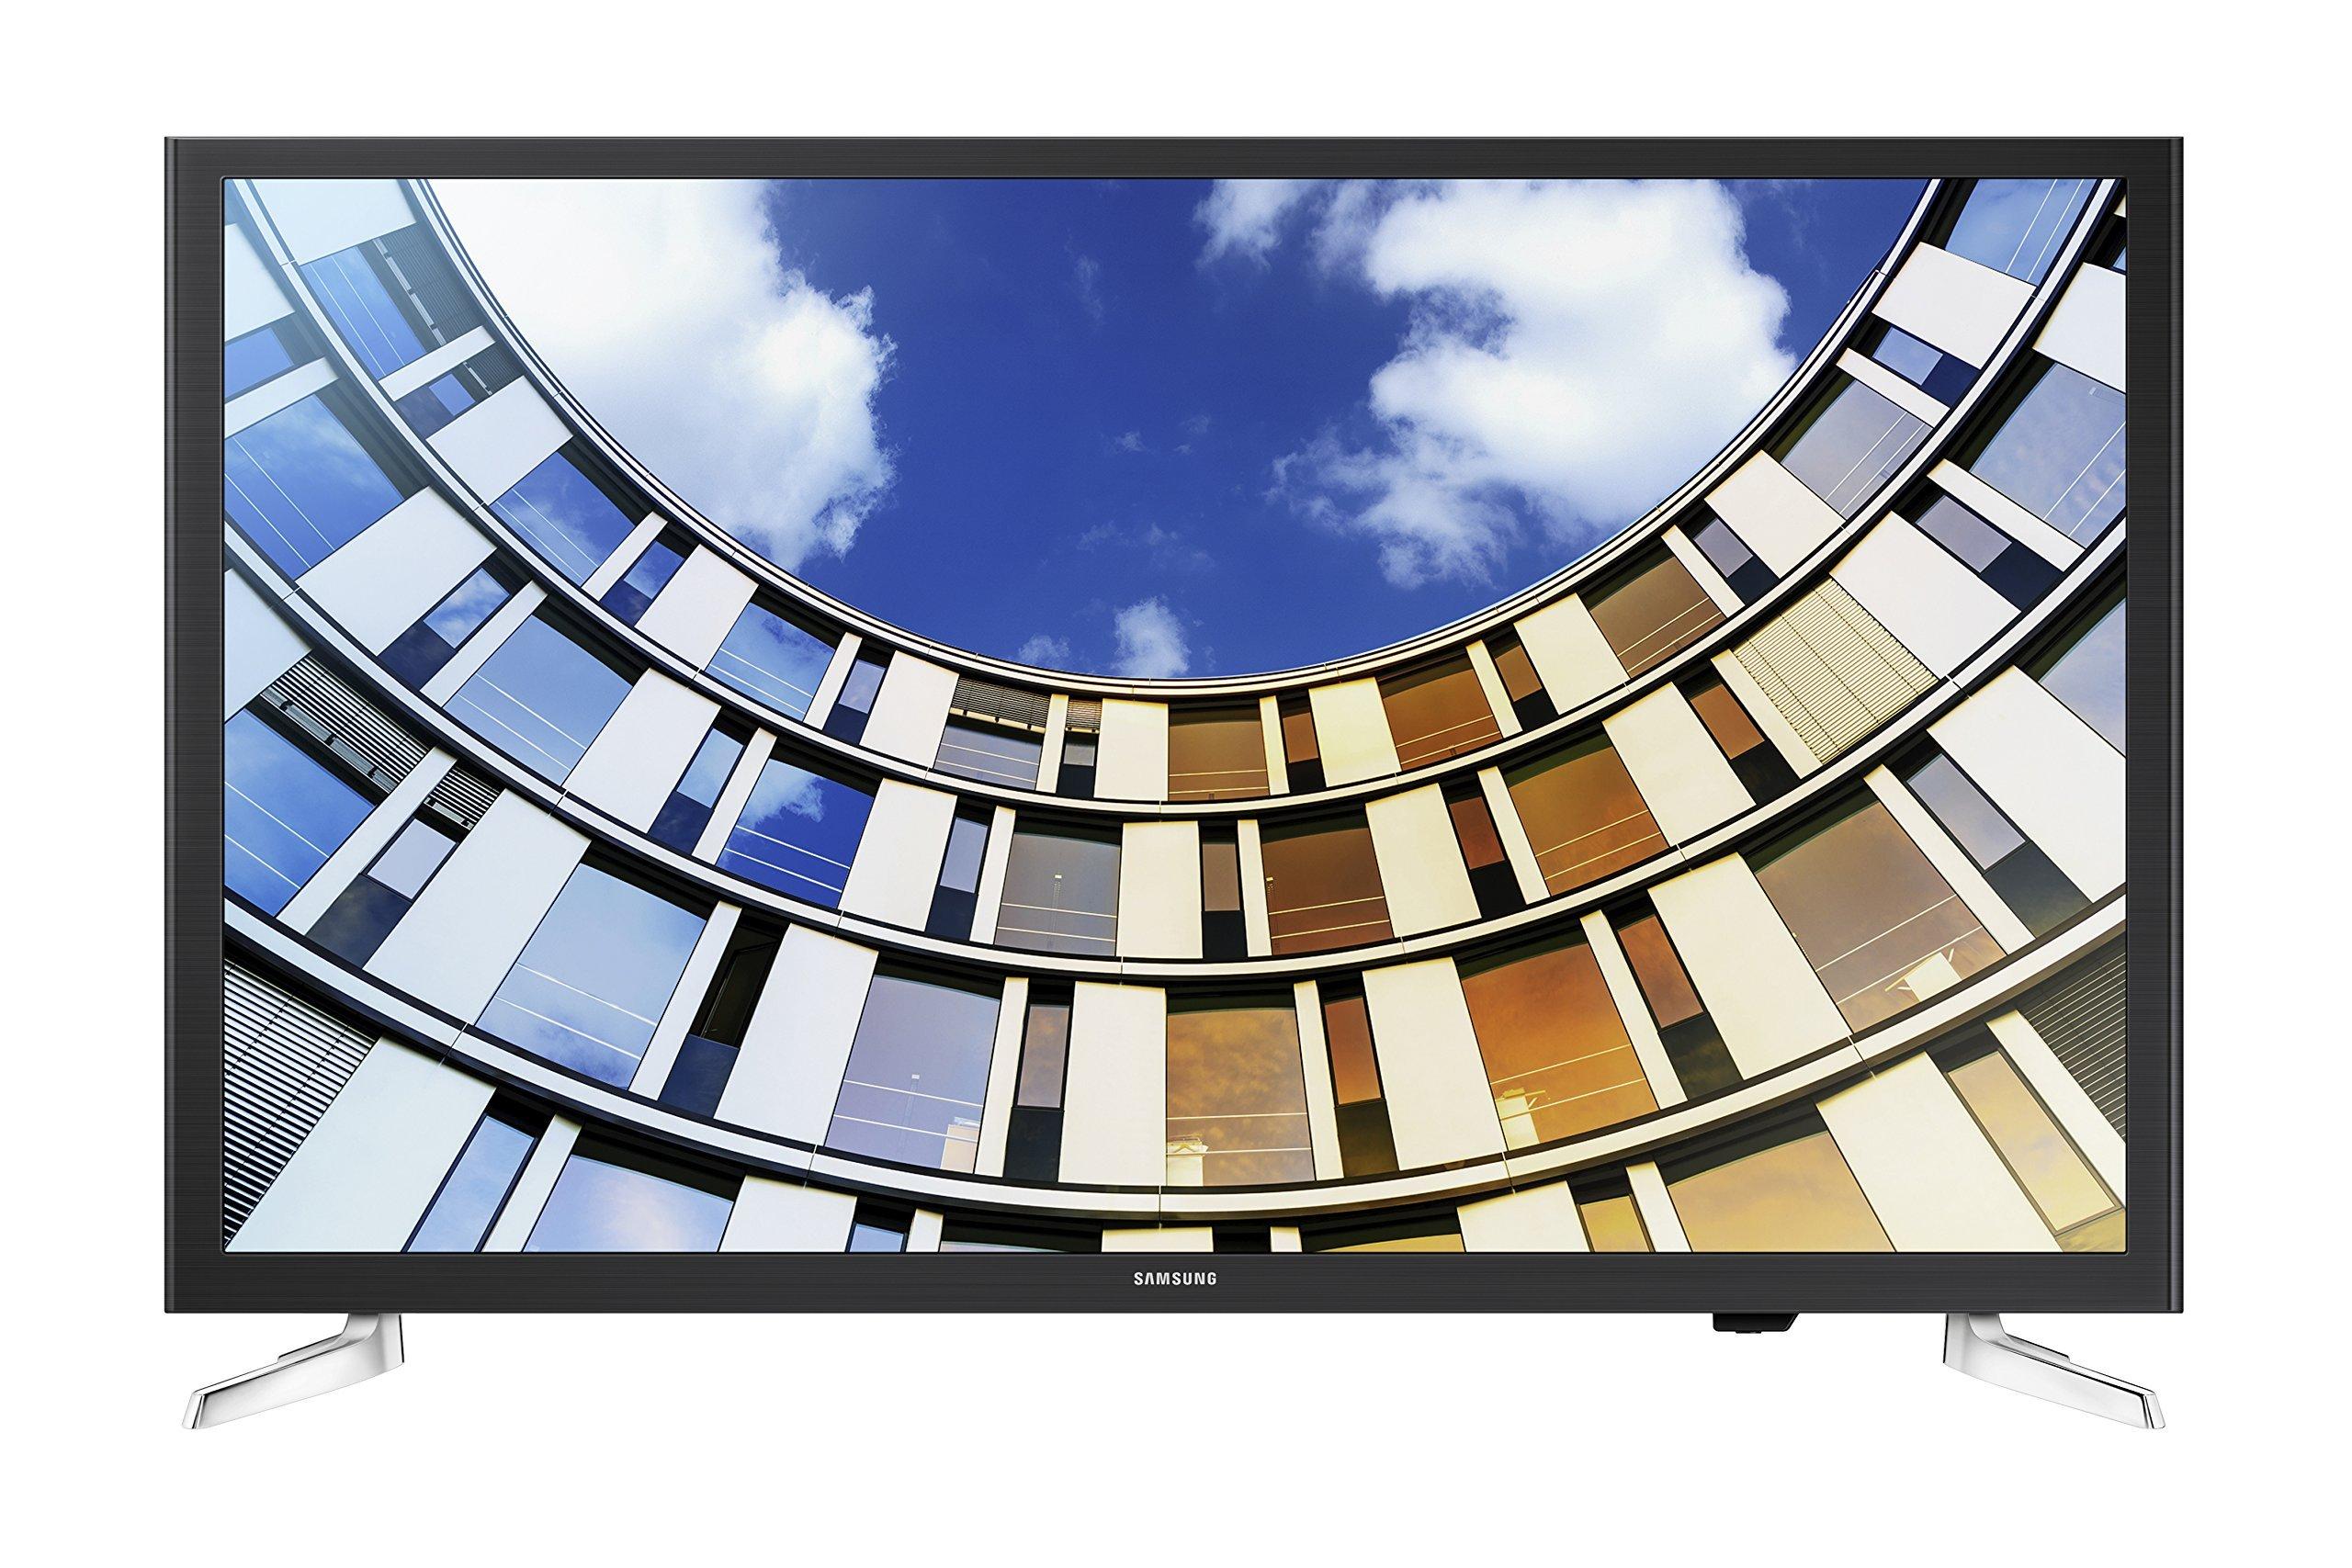 Samsung Electronics UN40M5300AFXZA Flat LED 1920 x 1080p 5 Series SmartTV 2017 (Certified Refurbished) 1